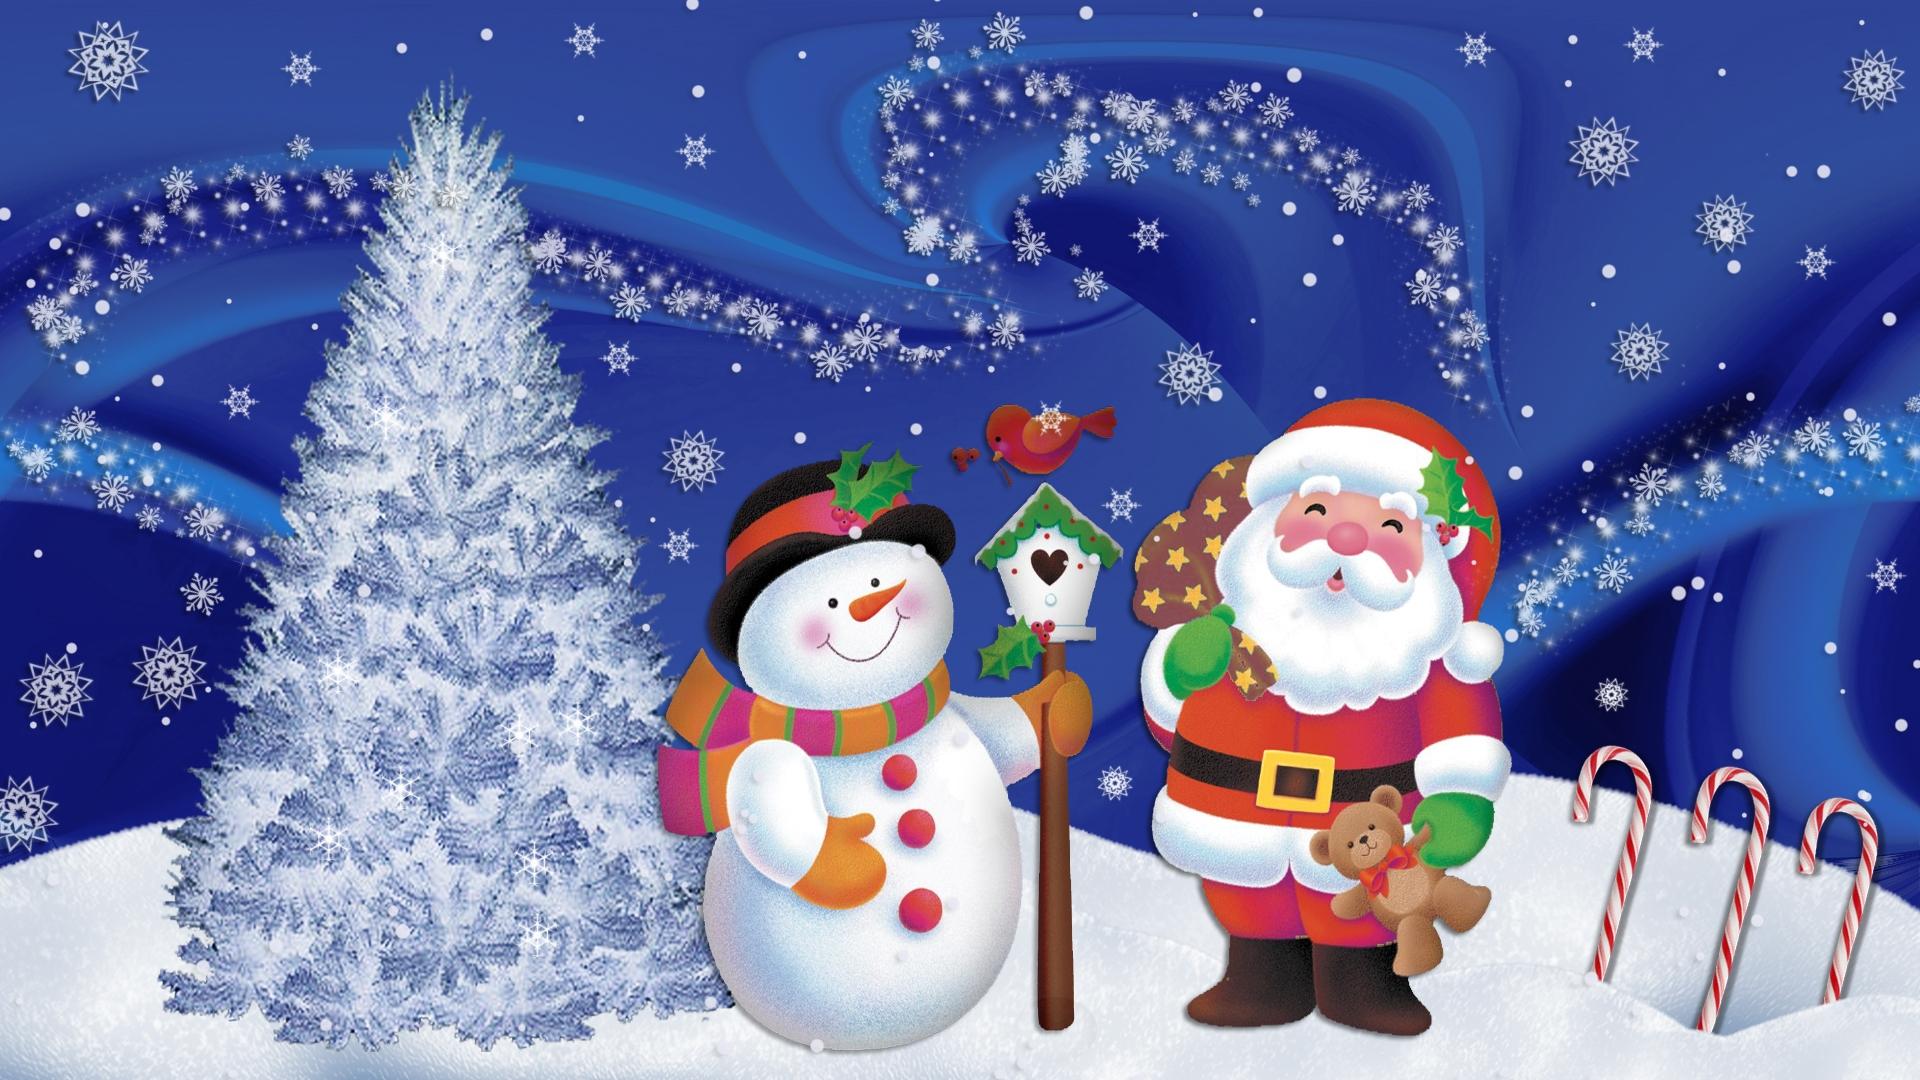 Merry Christmas wallpaper - 809191